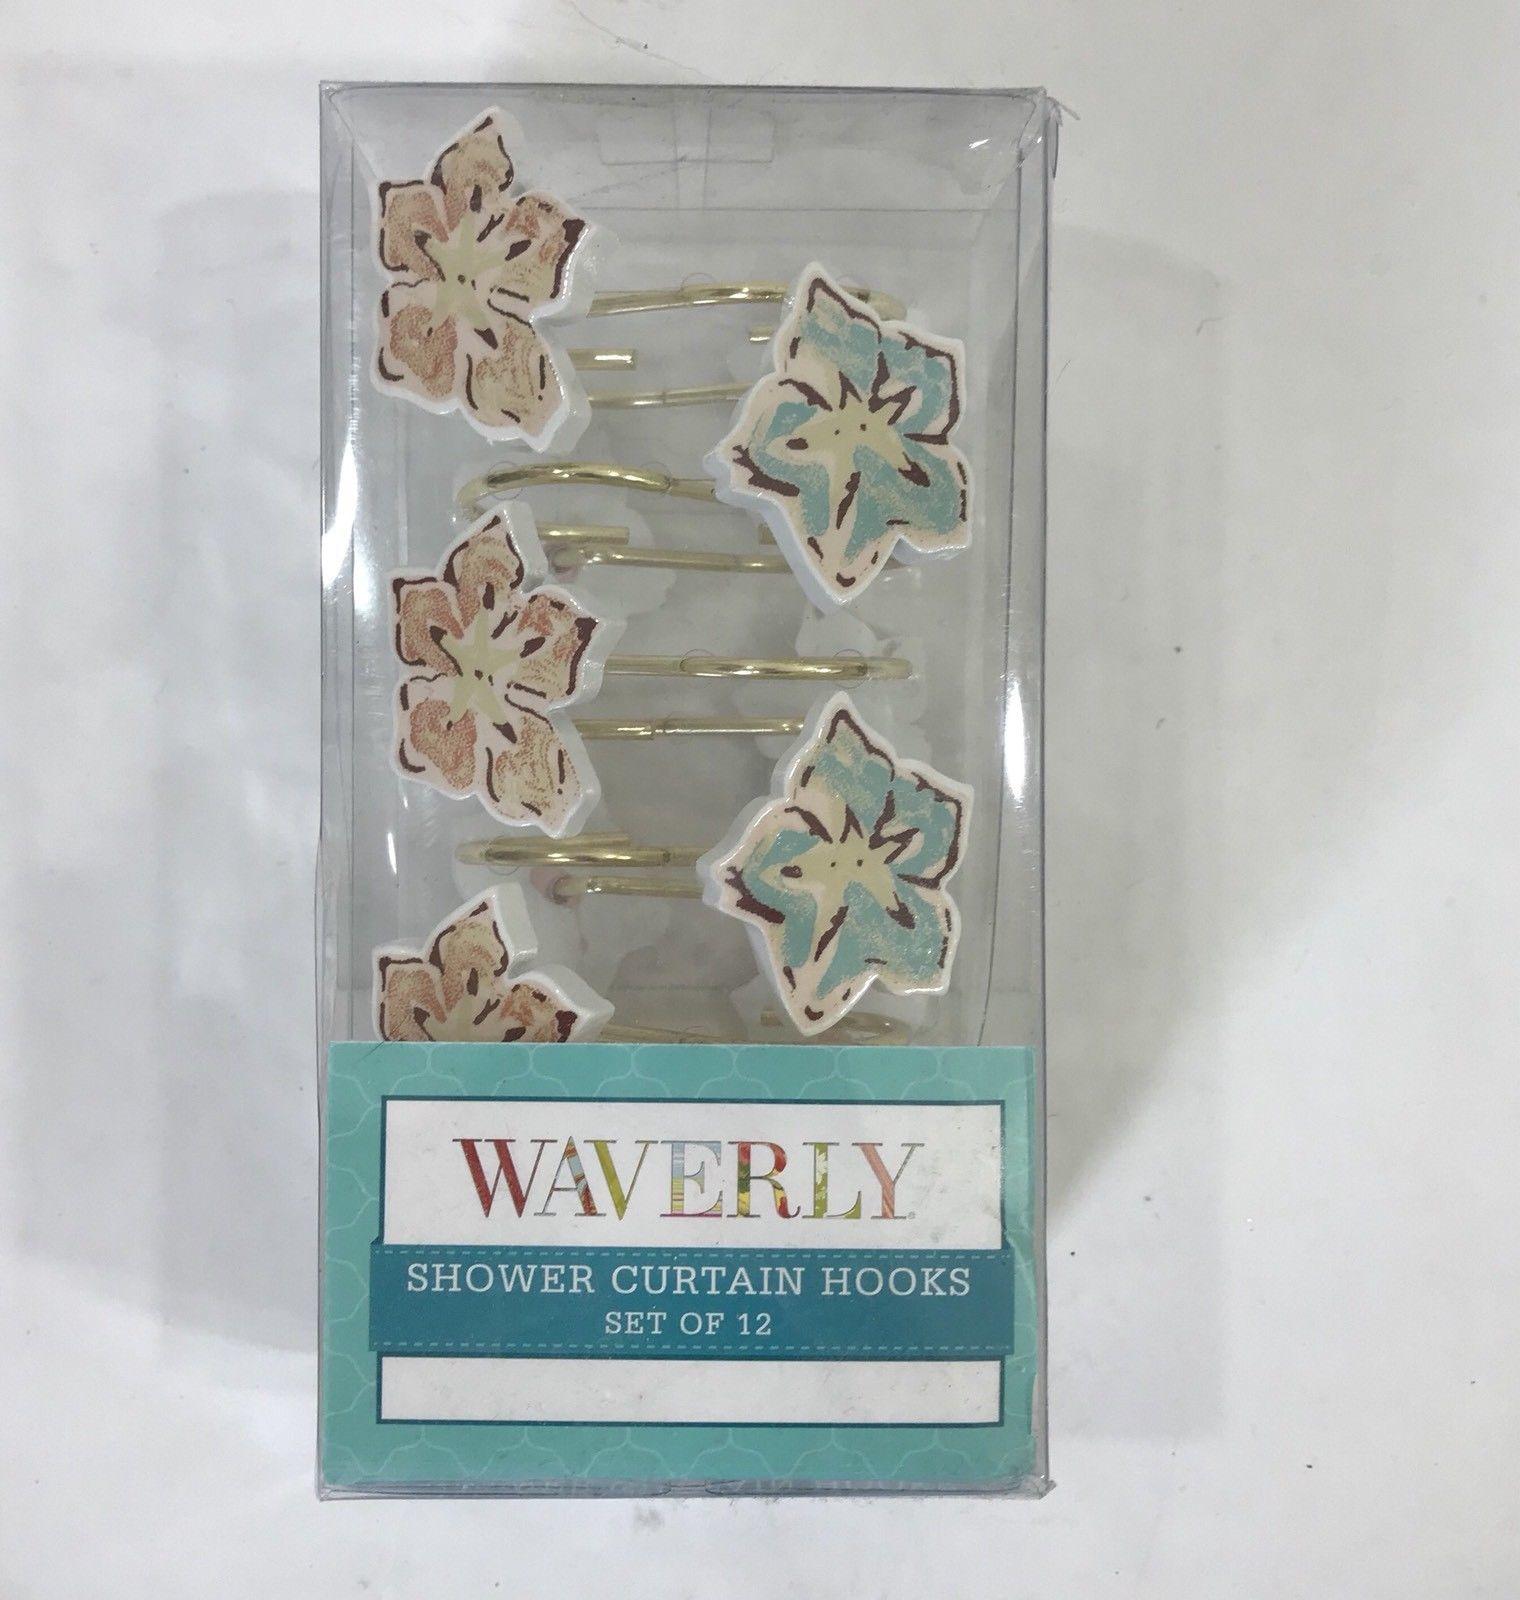 Waverly Honeymoon Shower Curtain Hooks Flower Set Of 12 Bathroom Decor